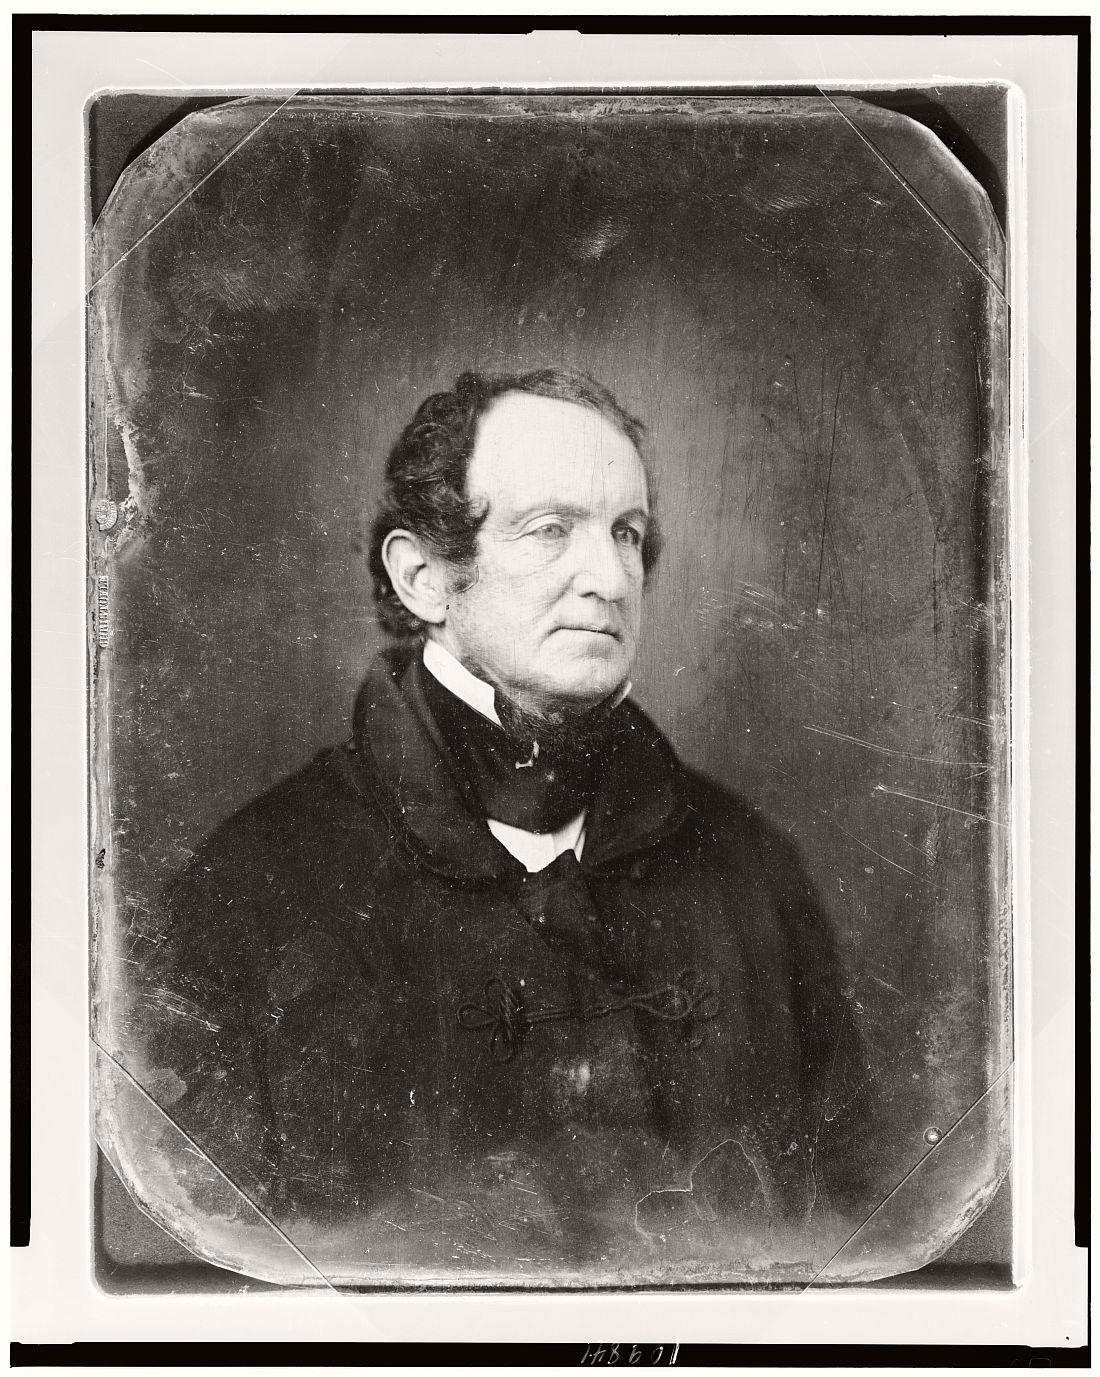 vintage-daguerreotype-portraits-from-xix-century-1844-1860-05